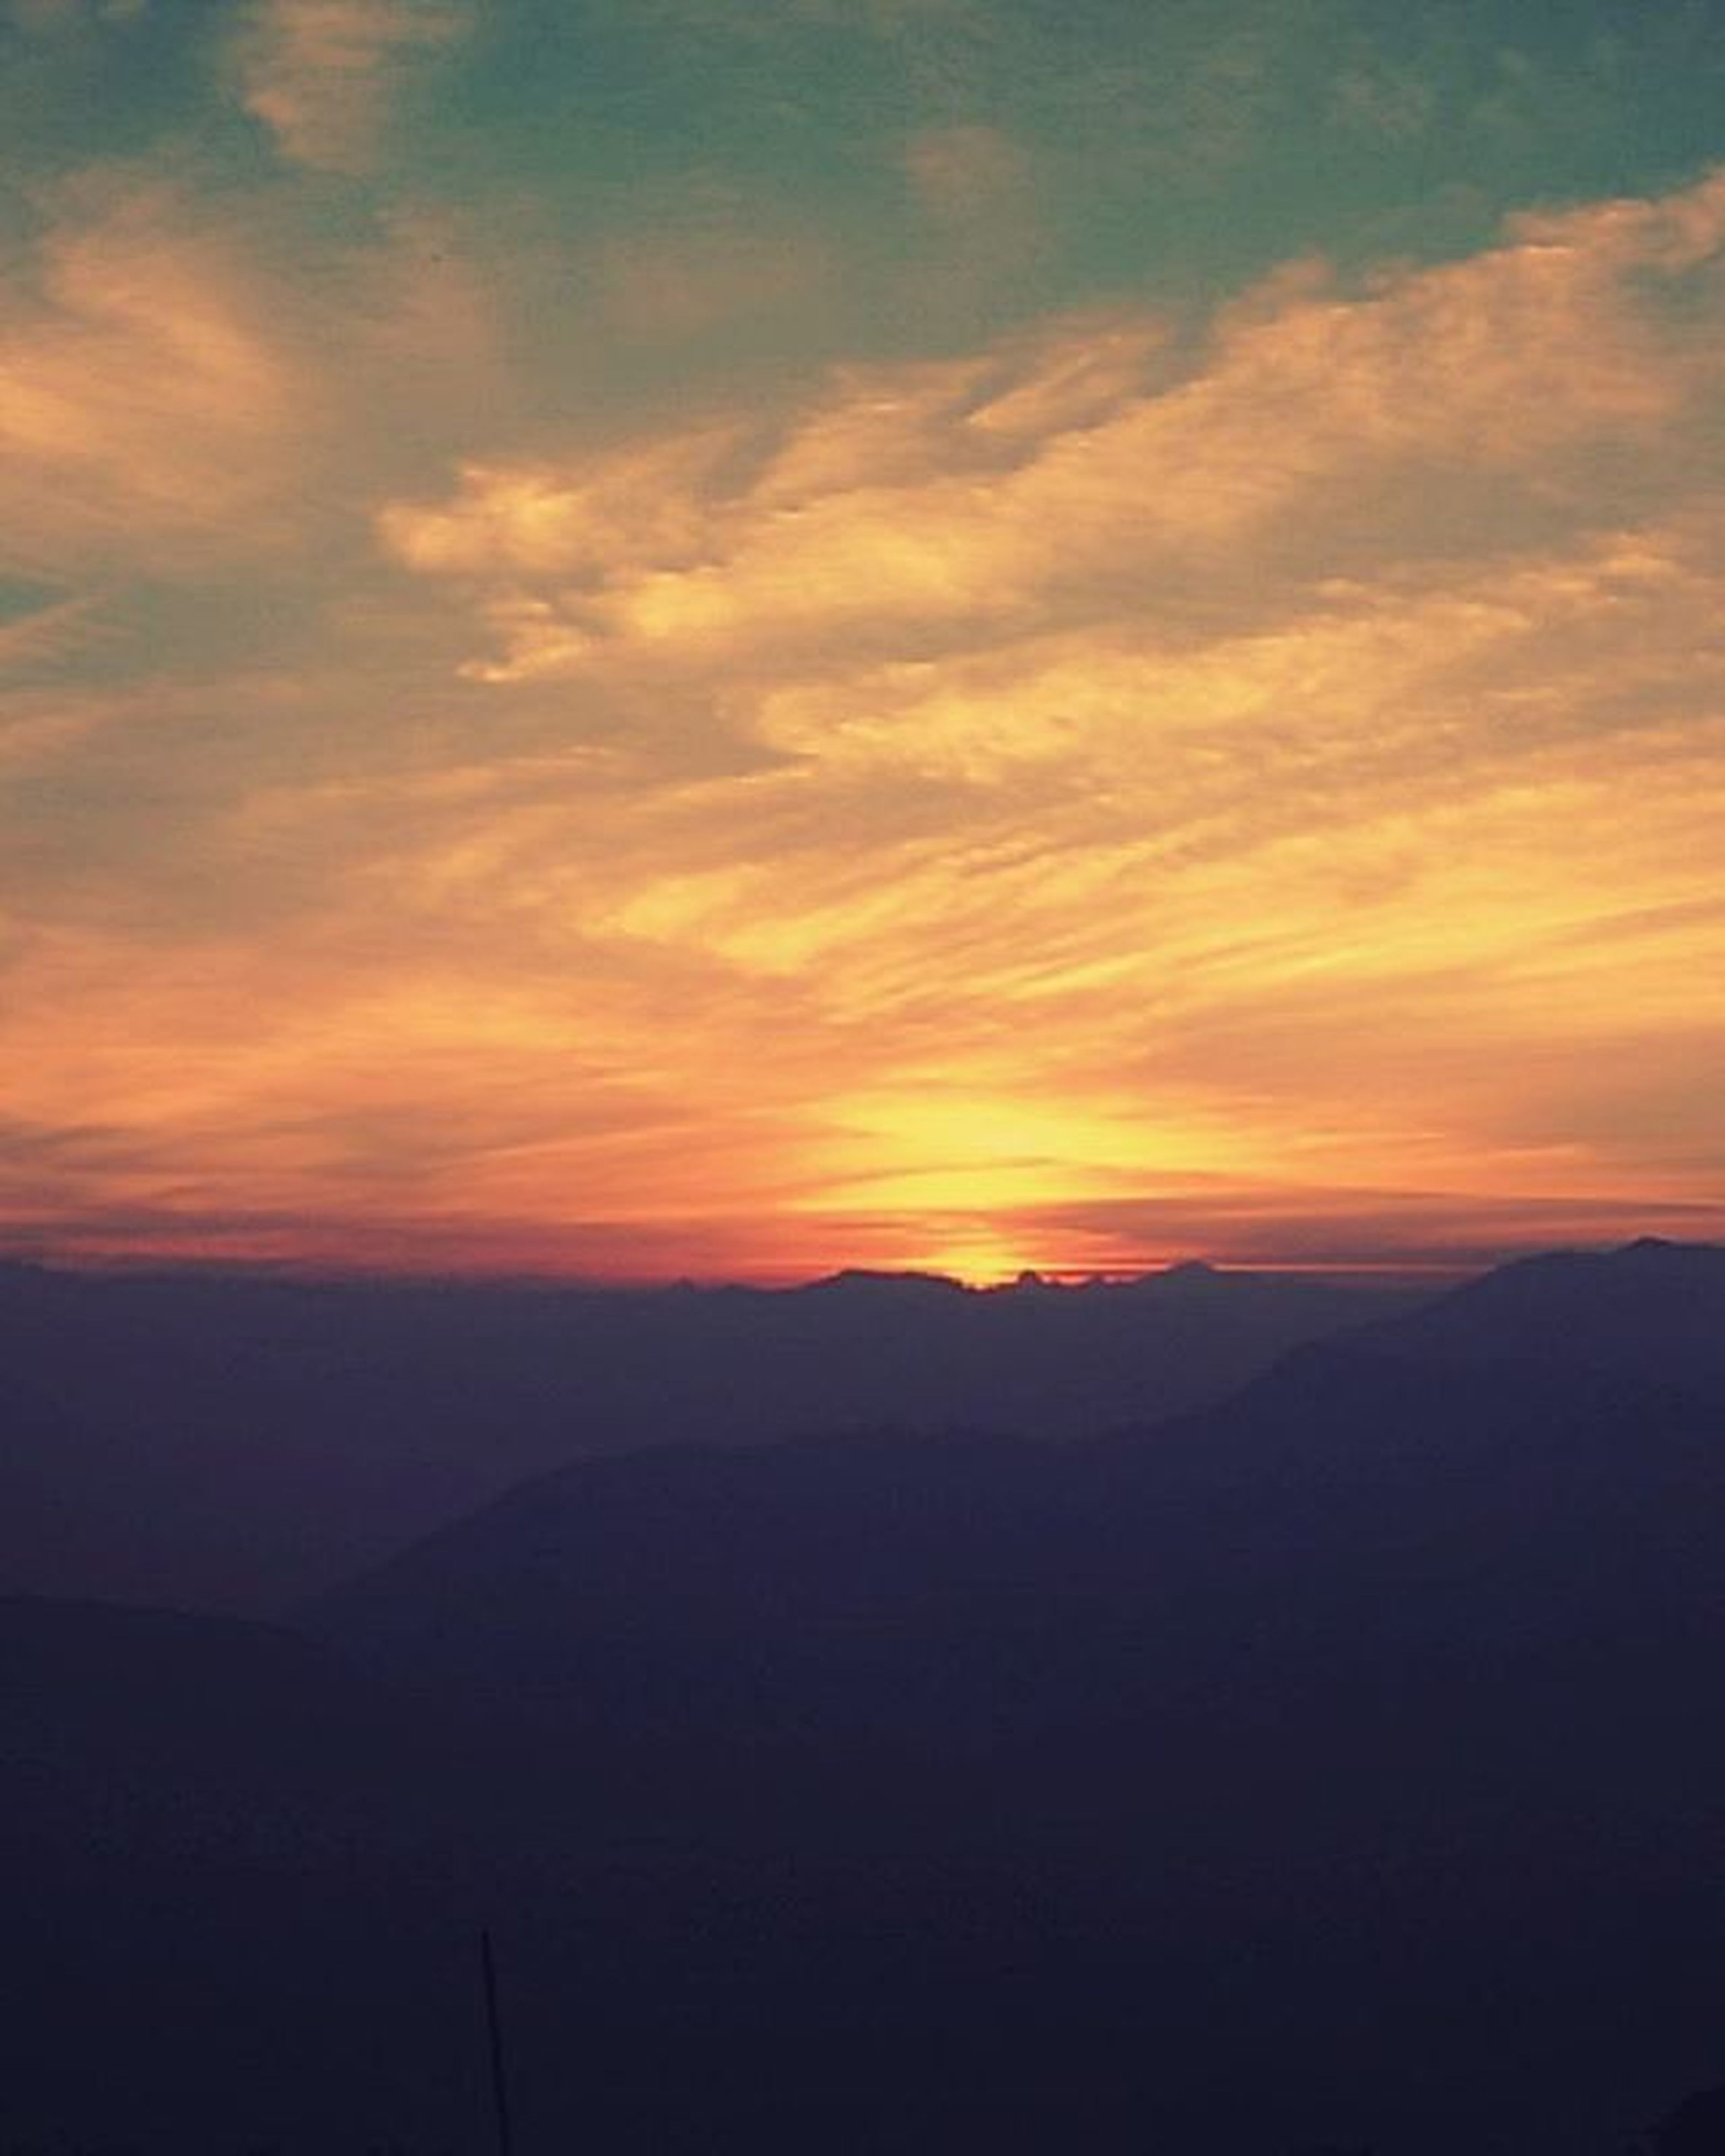 sunset, scenics, tranquil scene, tranquility, beauty in nature, orange color, mountain, sky, silhouette, landscape, idyllic, nature, mountain range, cloud - sky, dramatic sky, majestic, non-urban scene, cloud, outdoors, remote